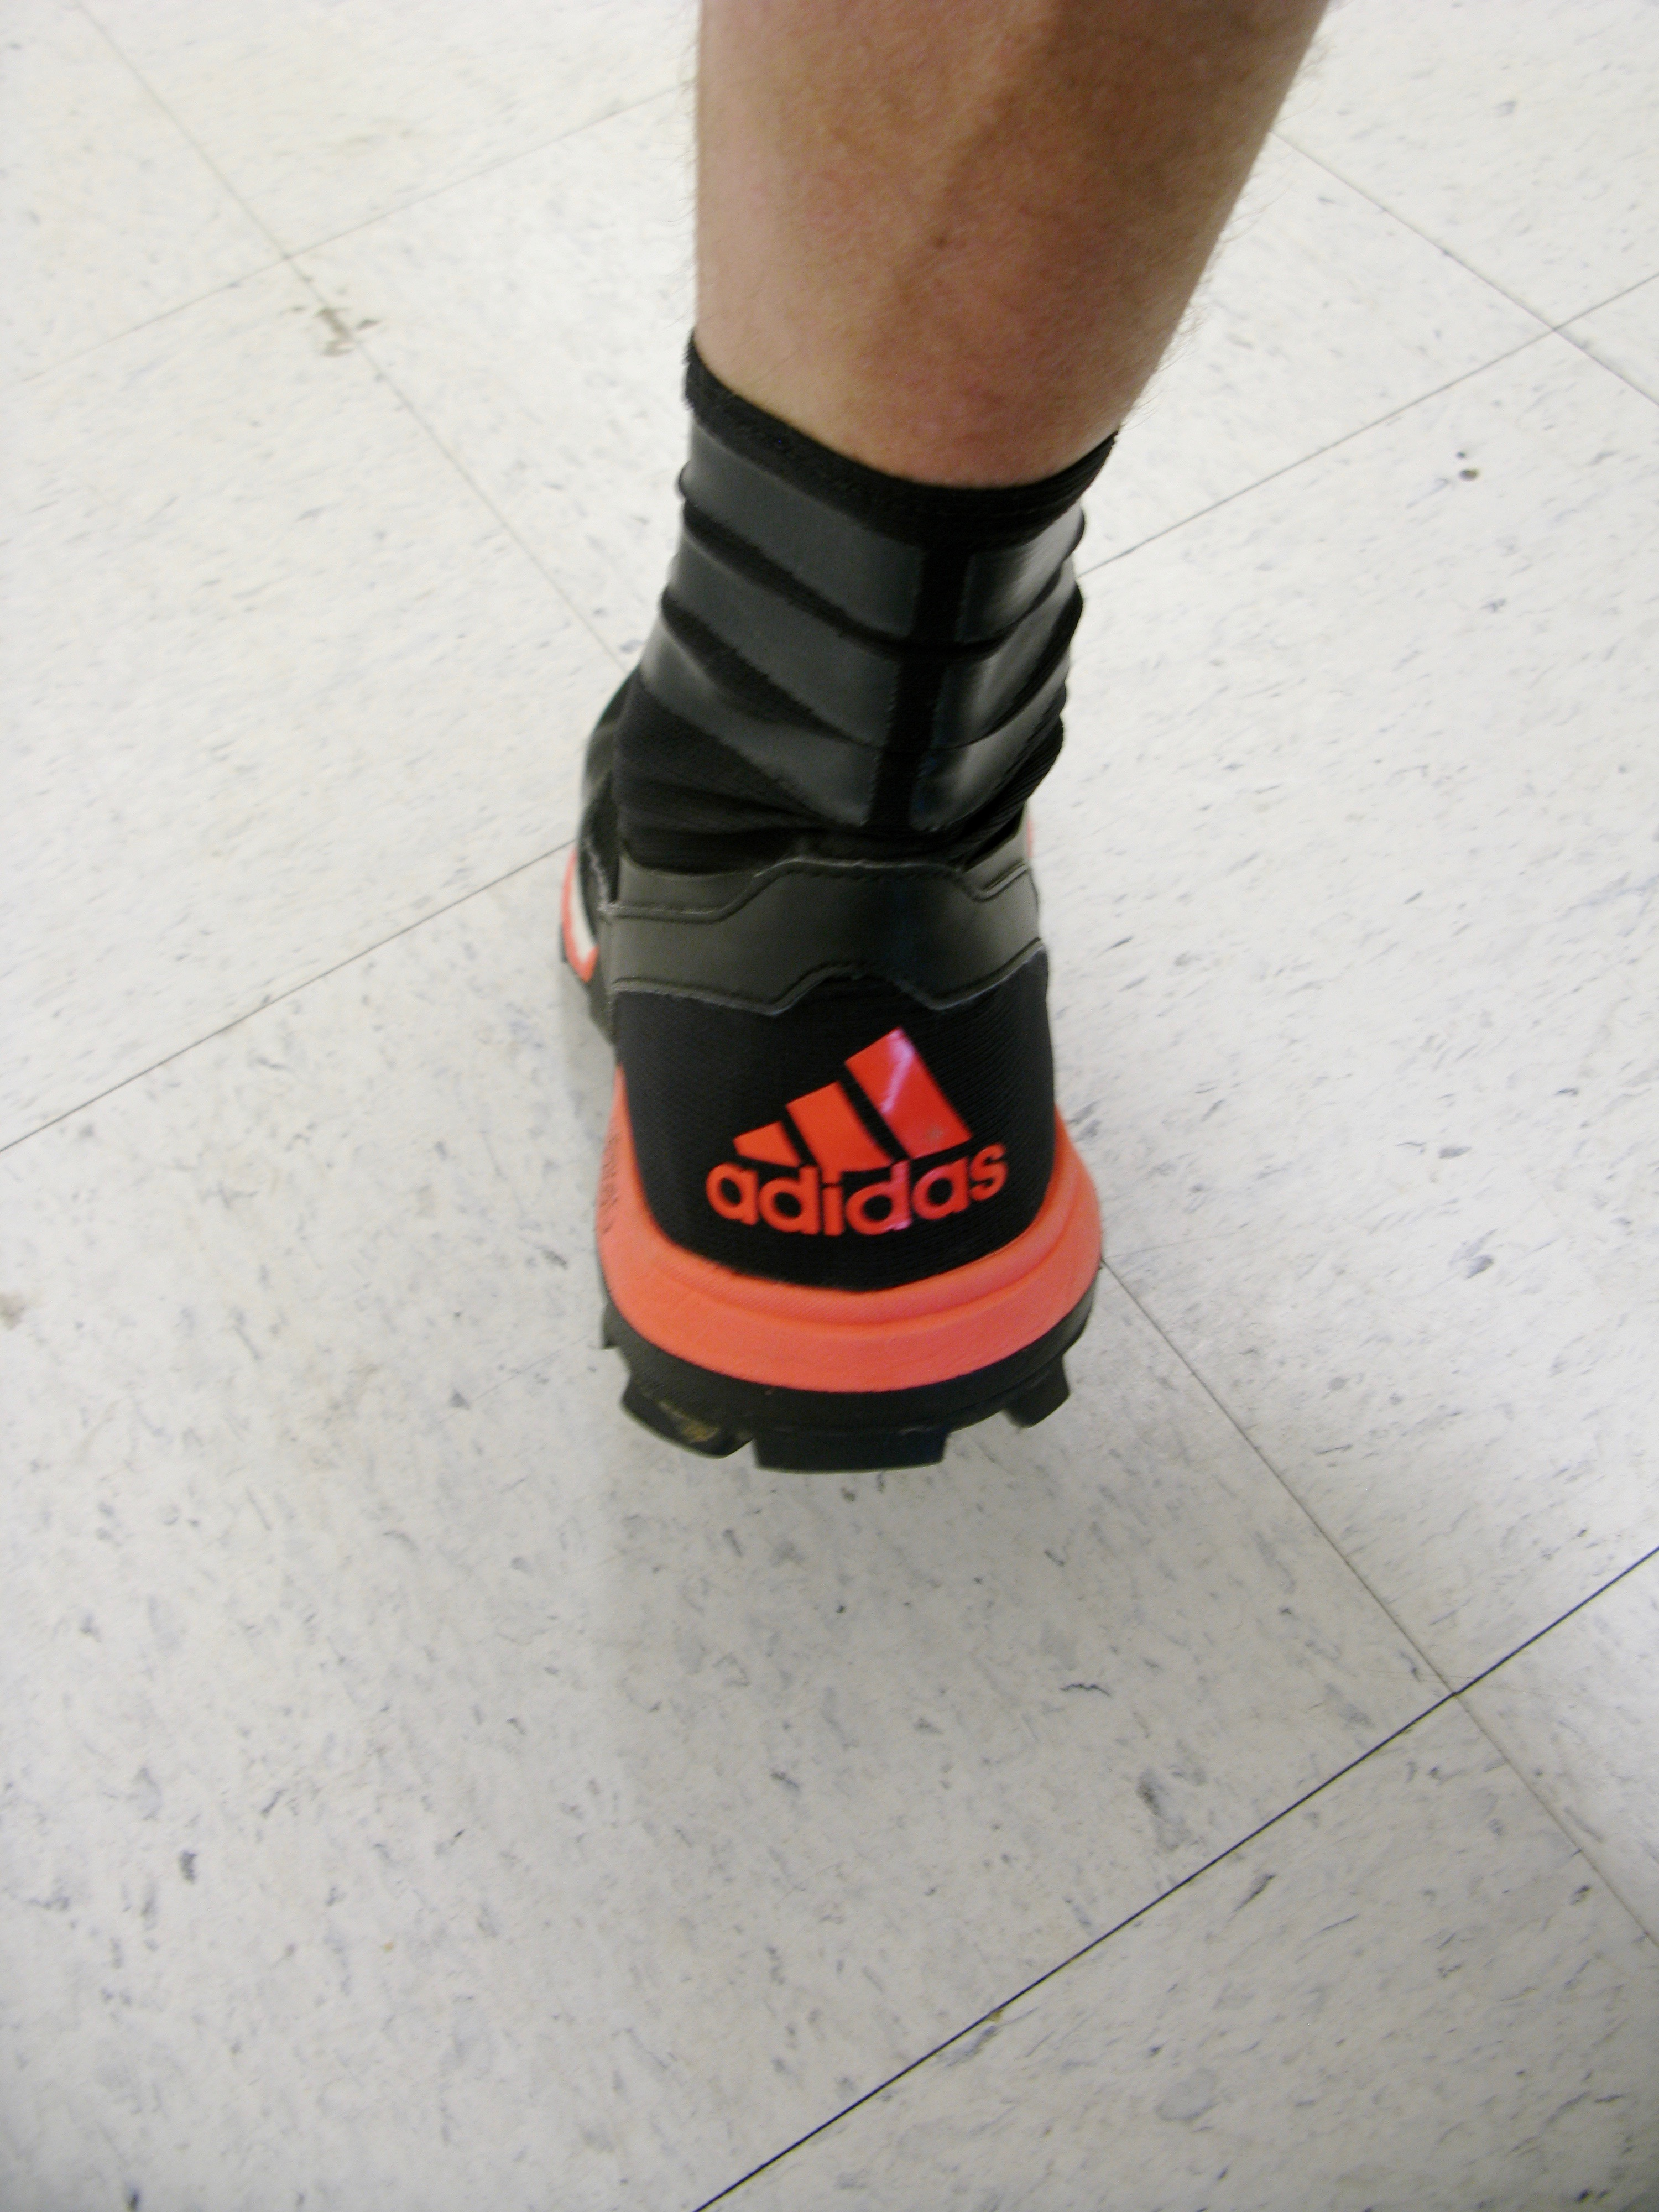 Adidas Boost Xt